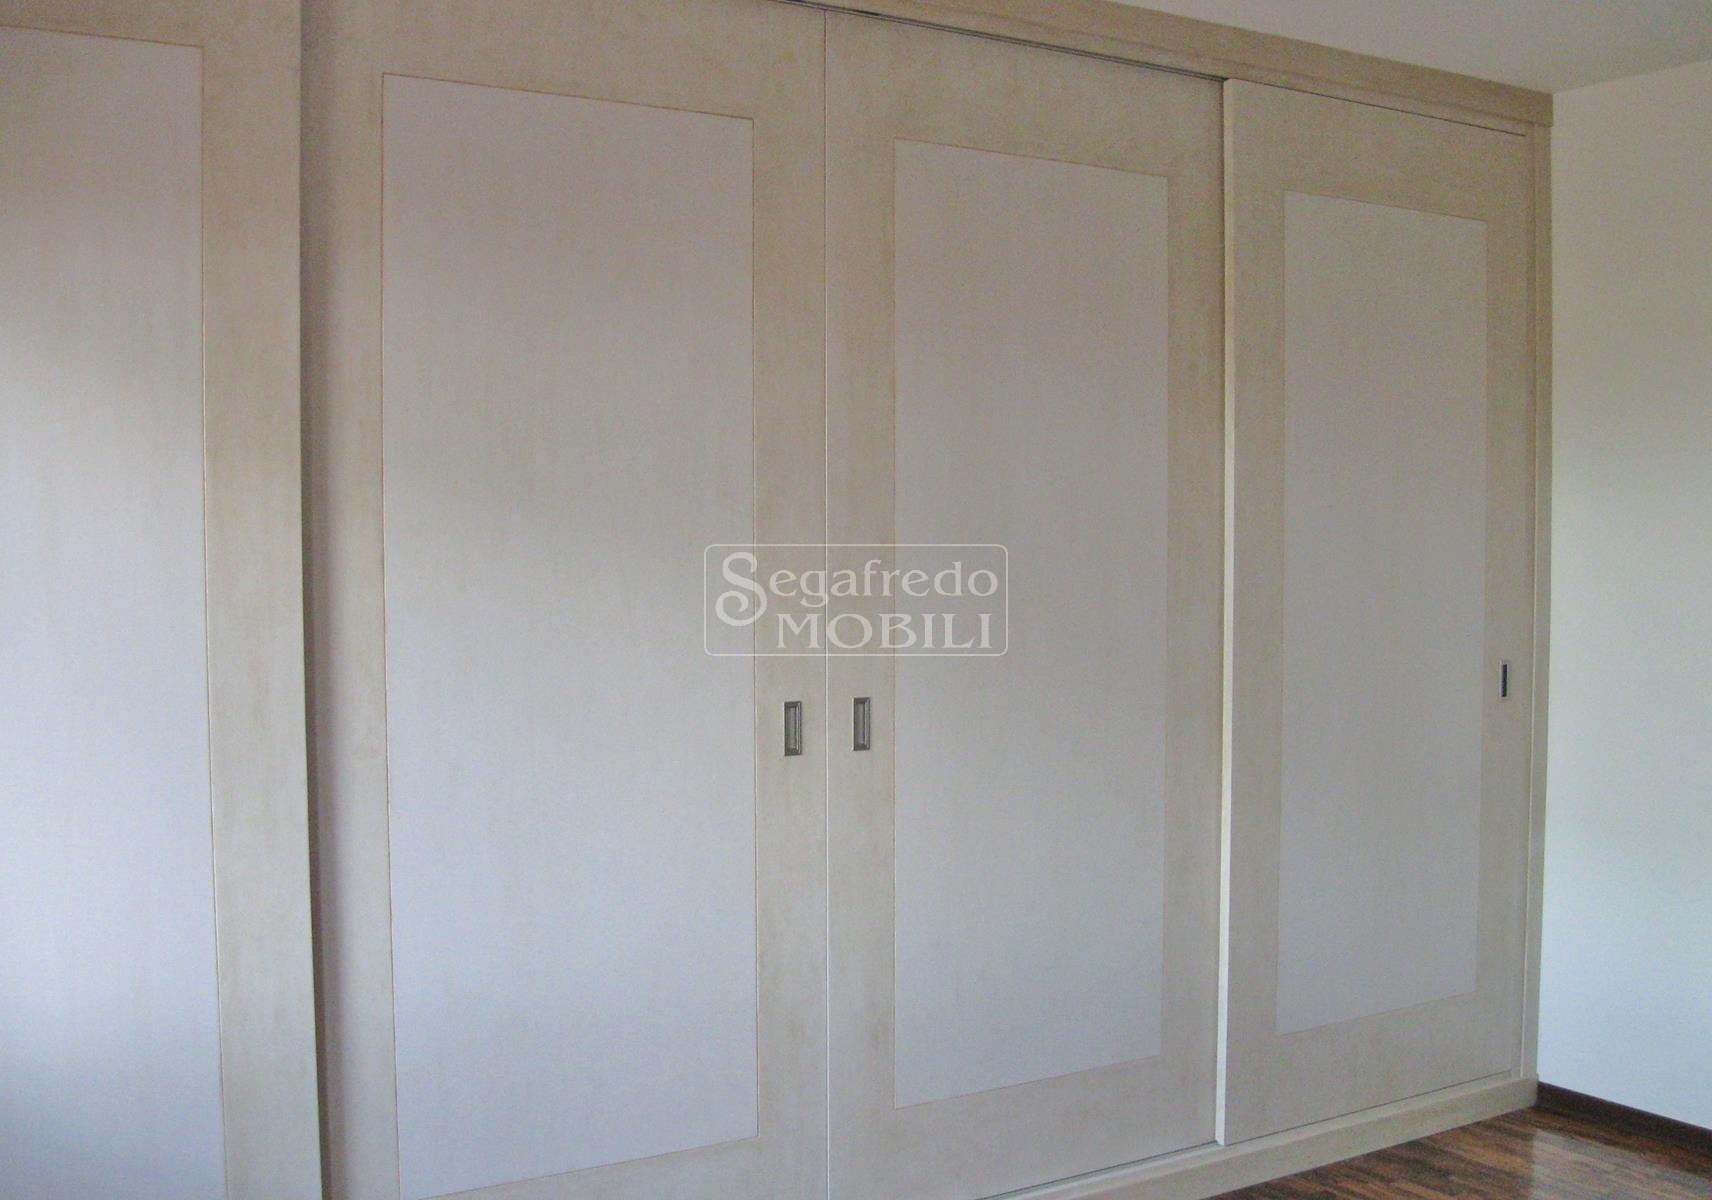 Kit Ante Scorrevoli Armadio A Muro.Ante Scorrevoli Armadio A Muro Simple Angelini Arredamenti